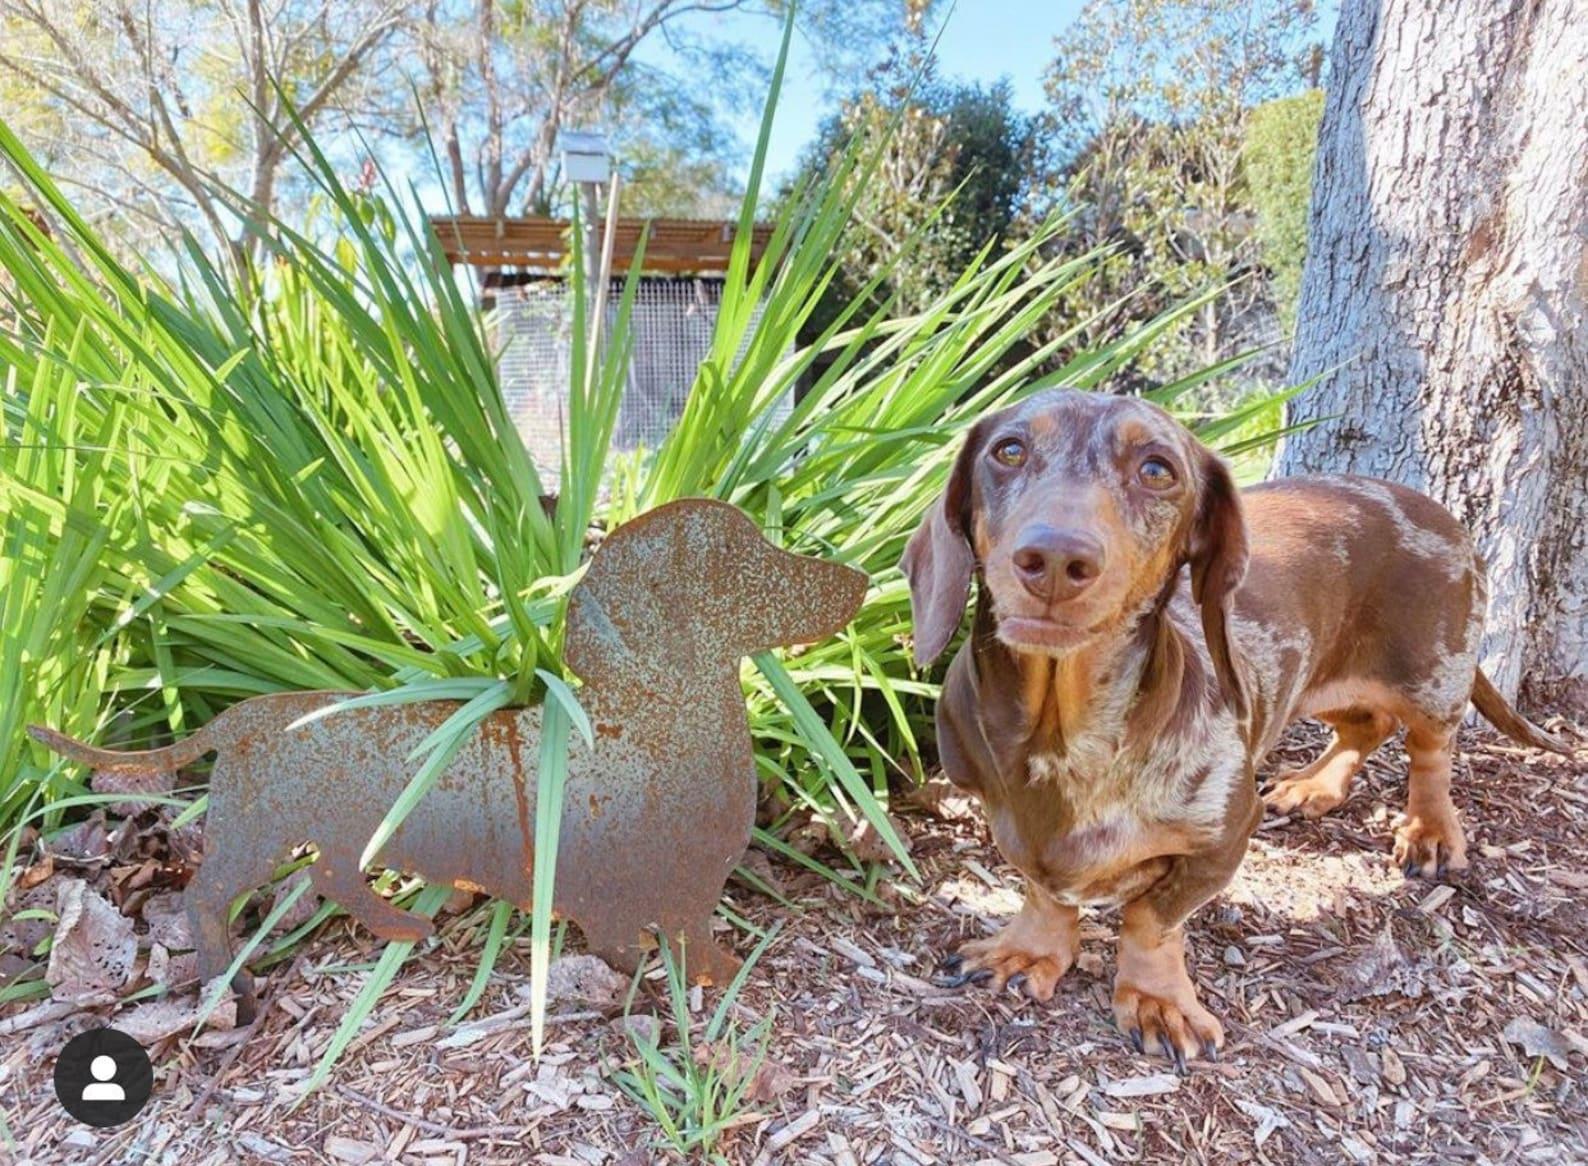 Dachshund standing next to a dachshund statue